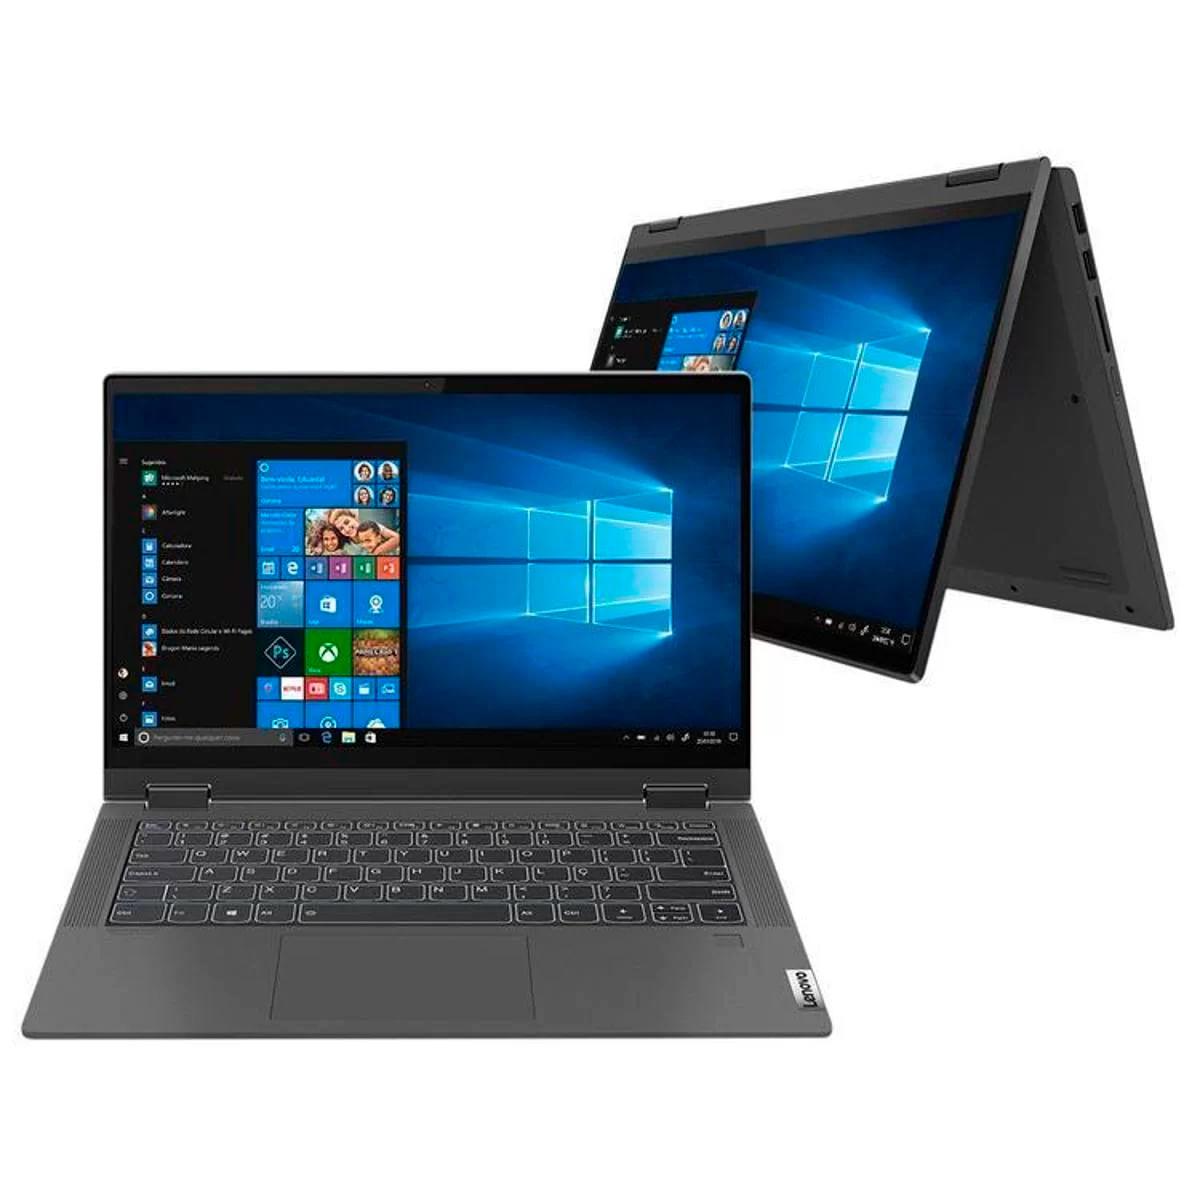 "Notebook - Lenovo 81ws0002br I5-1035g1 1.00ghz 8gb 256gb Ssd Intel Hd Graphics Windows 10 Home Flex 5i 14"" Polegadas"